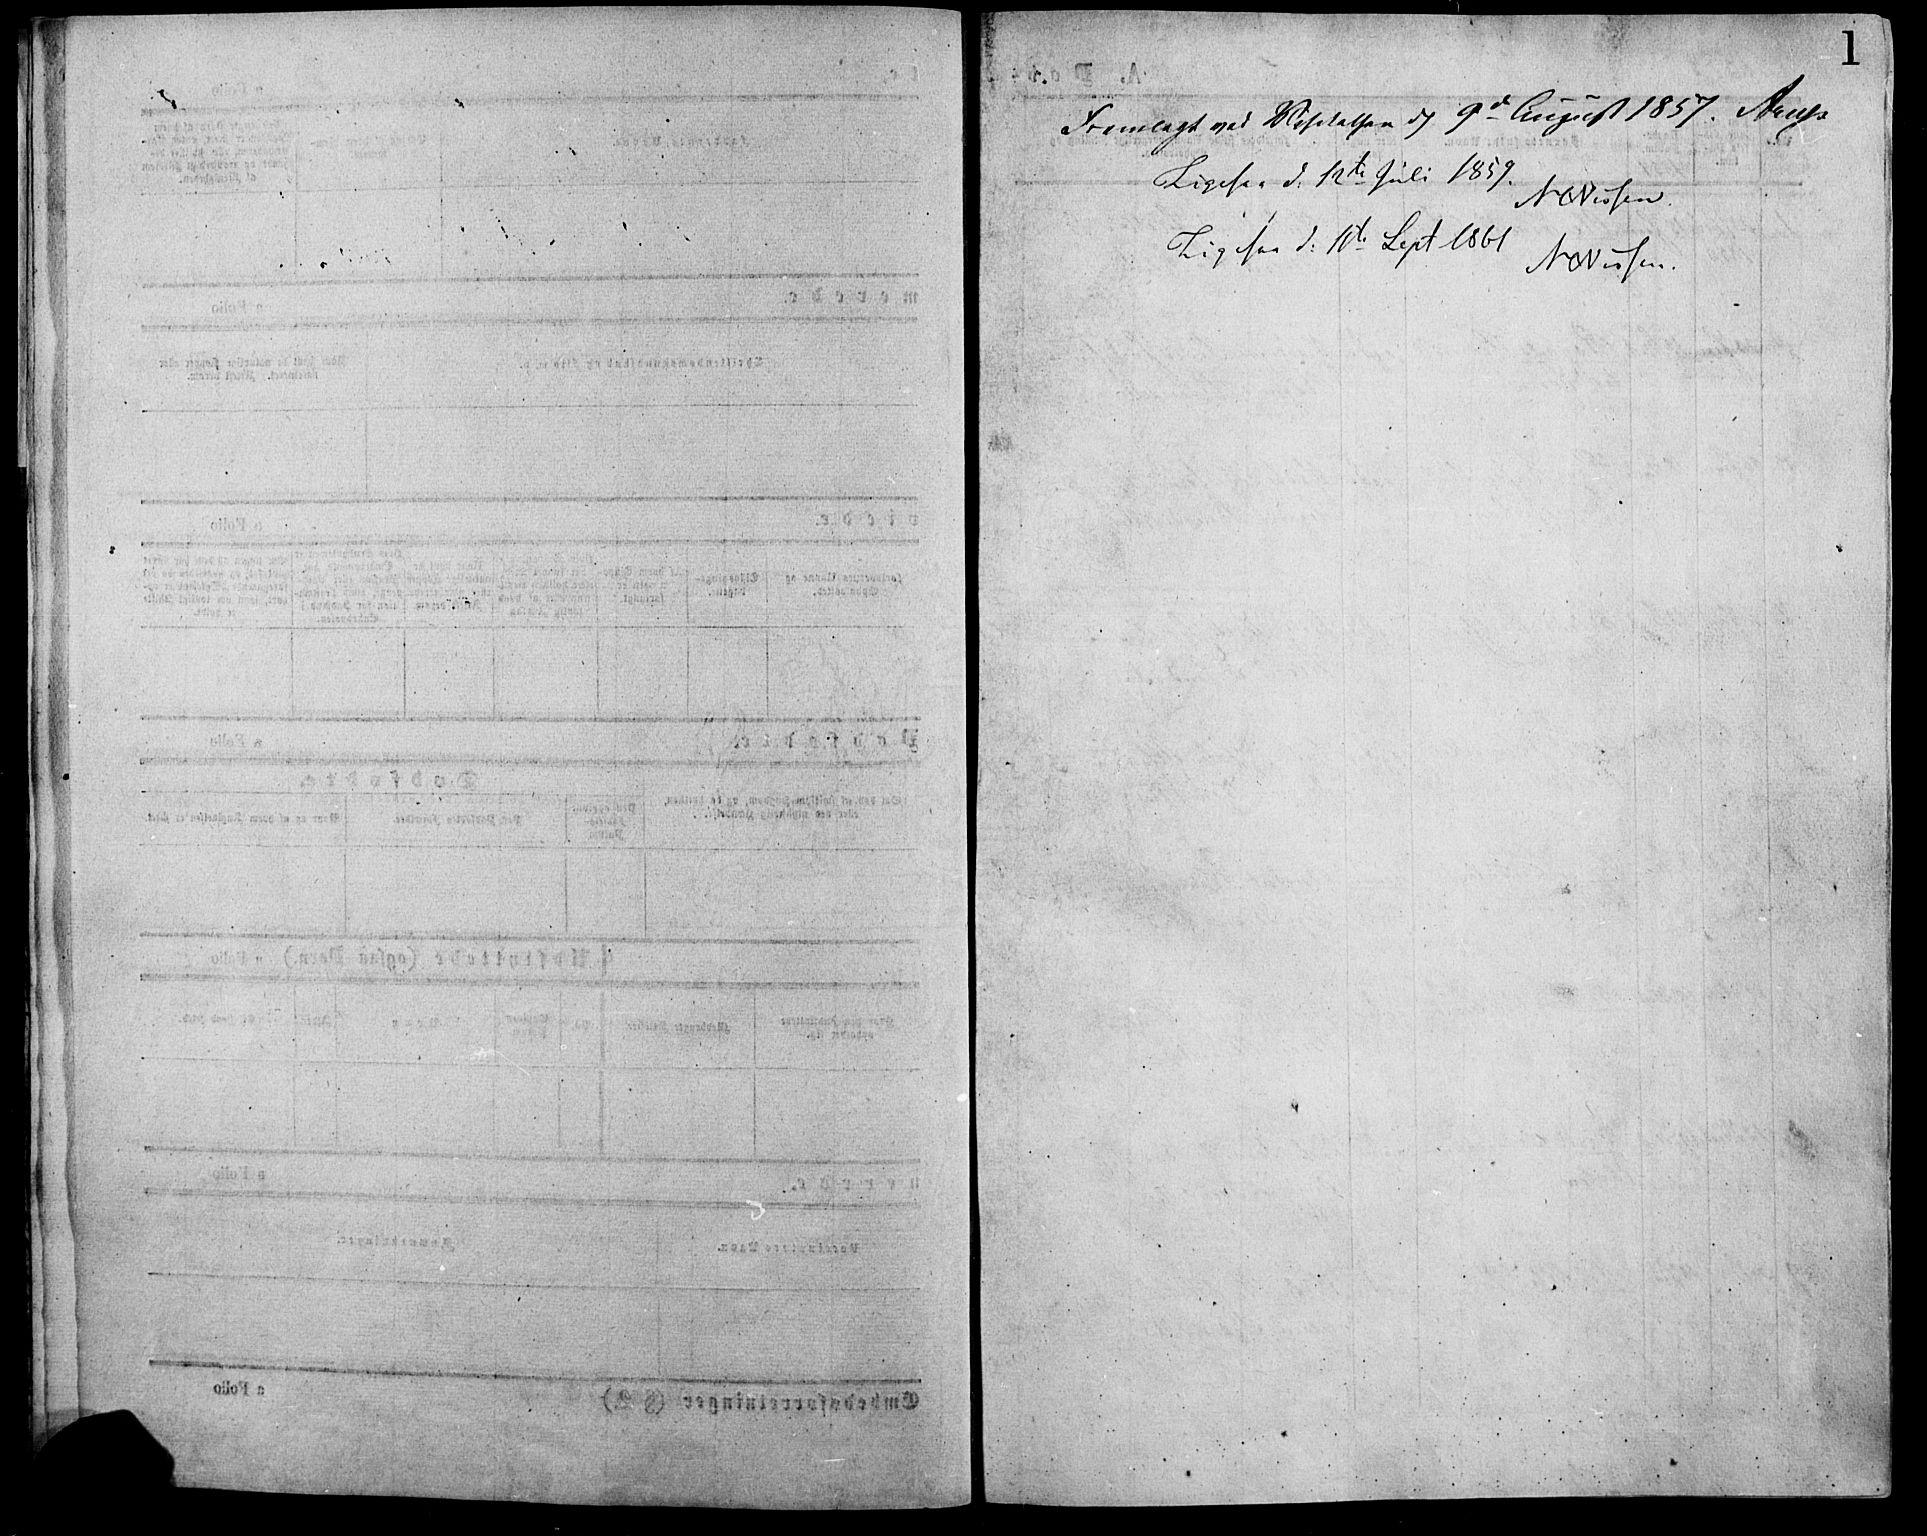 SAH, Lesja prestekontor, Ministerialbok nr. 7, 1854-1862, s. 1